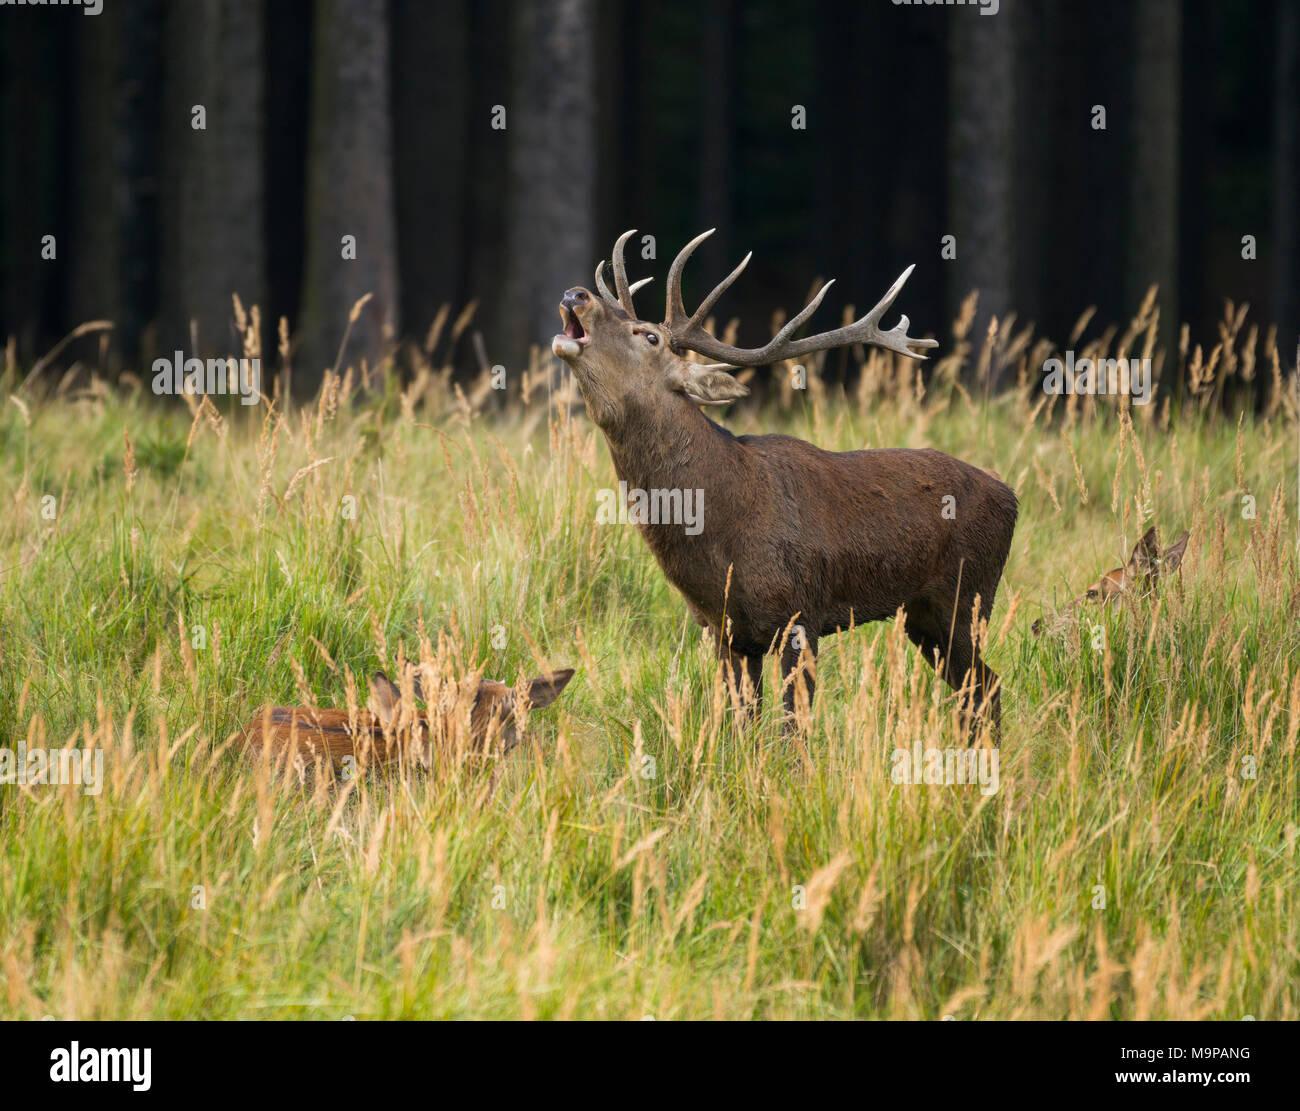 Red deer (Cervus elaphus) roars during rutting season, females lie in tall grass, captive, Germany - Stock Image